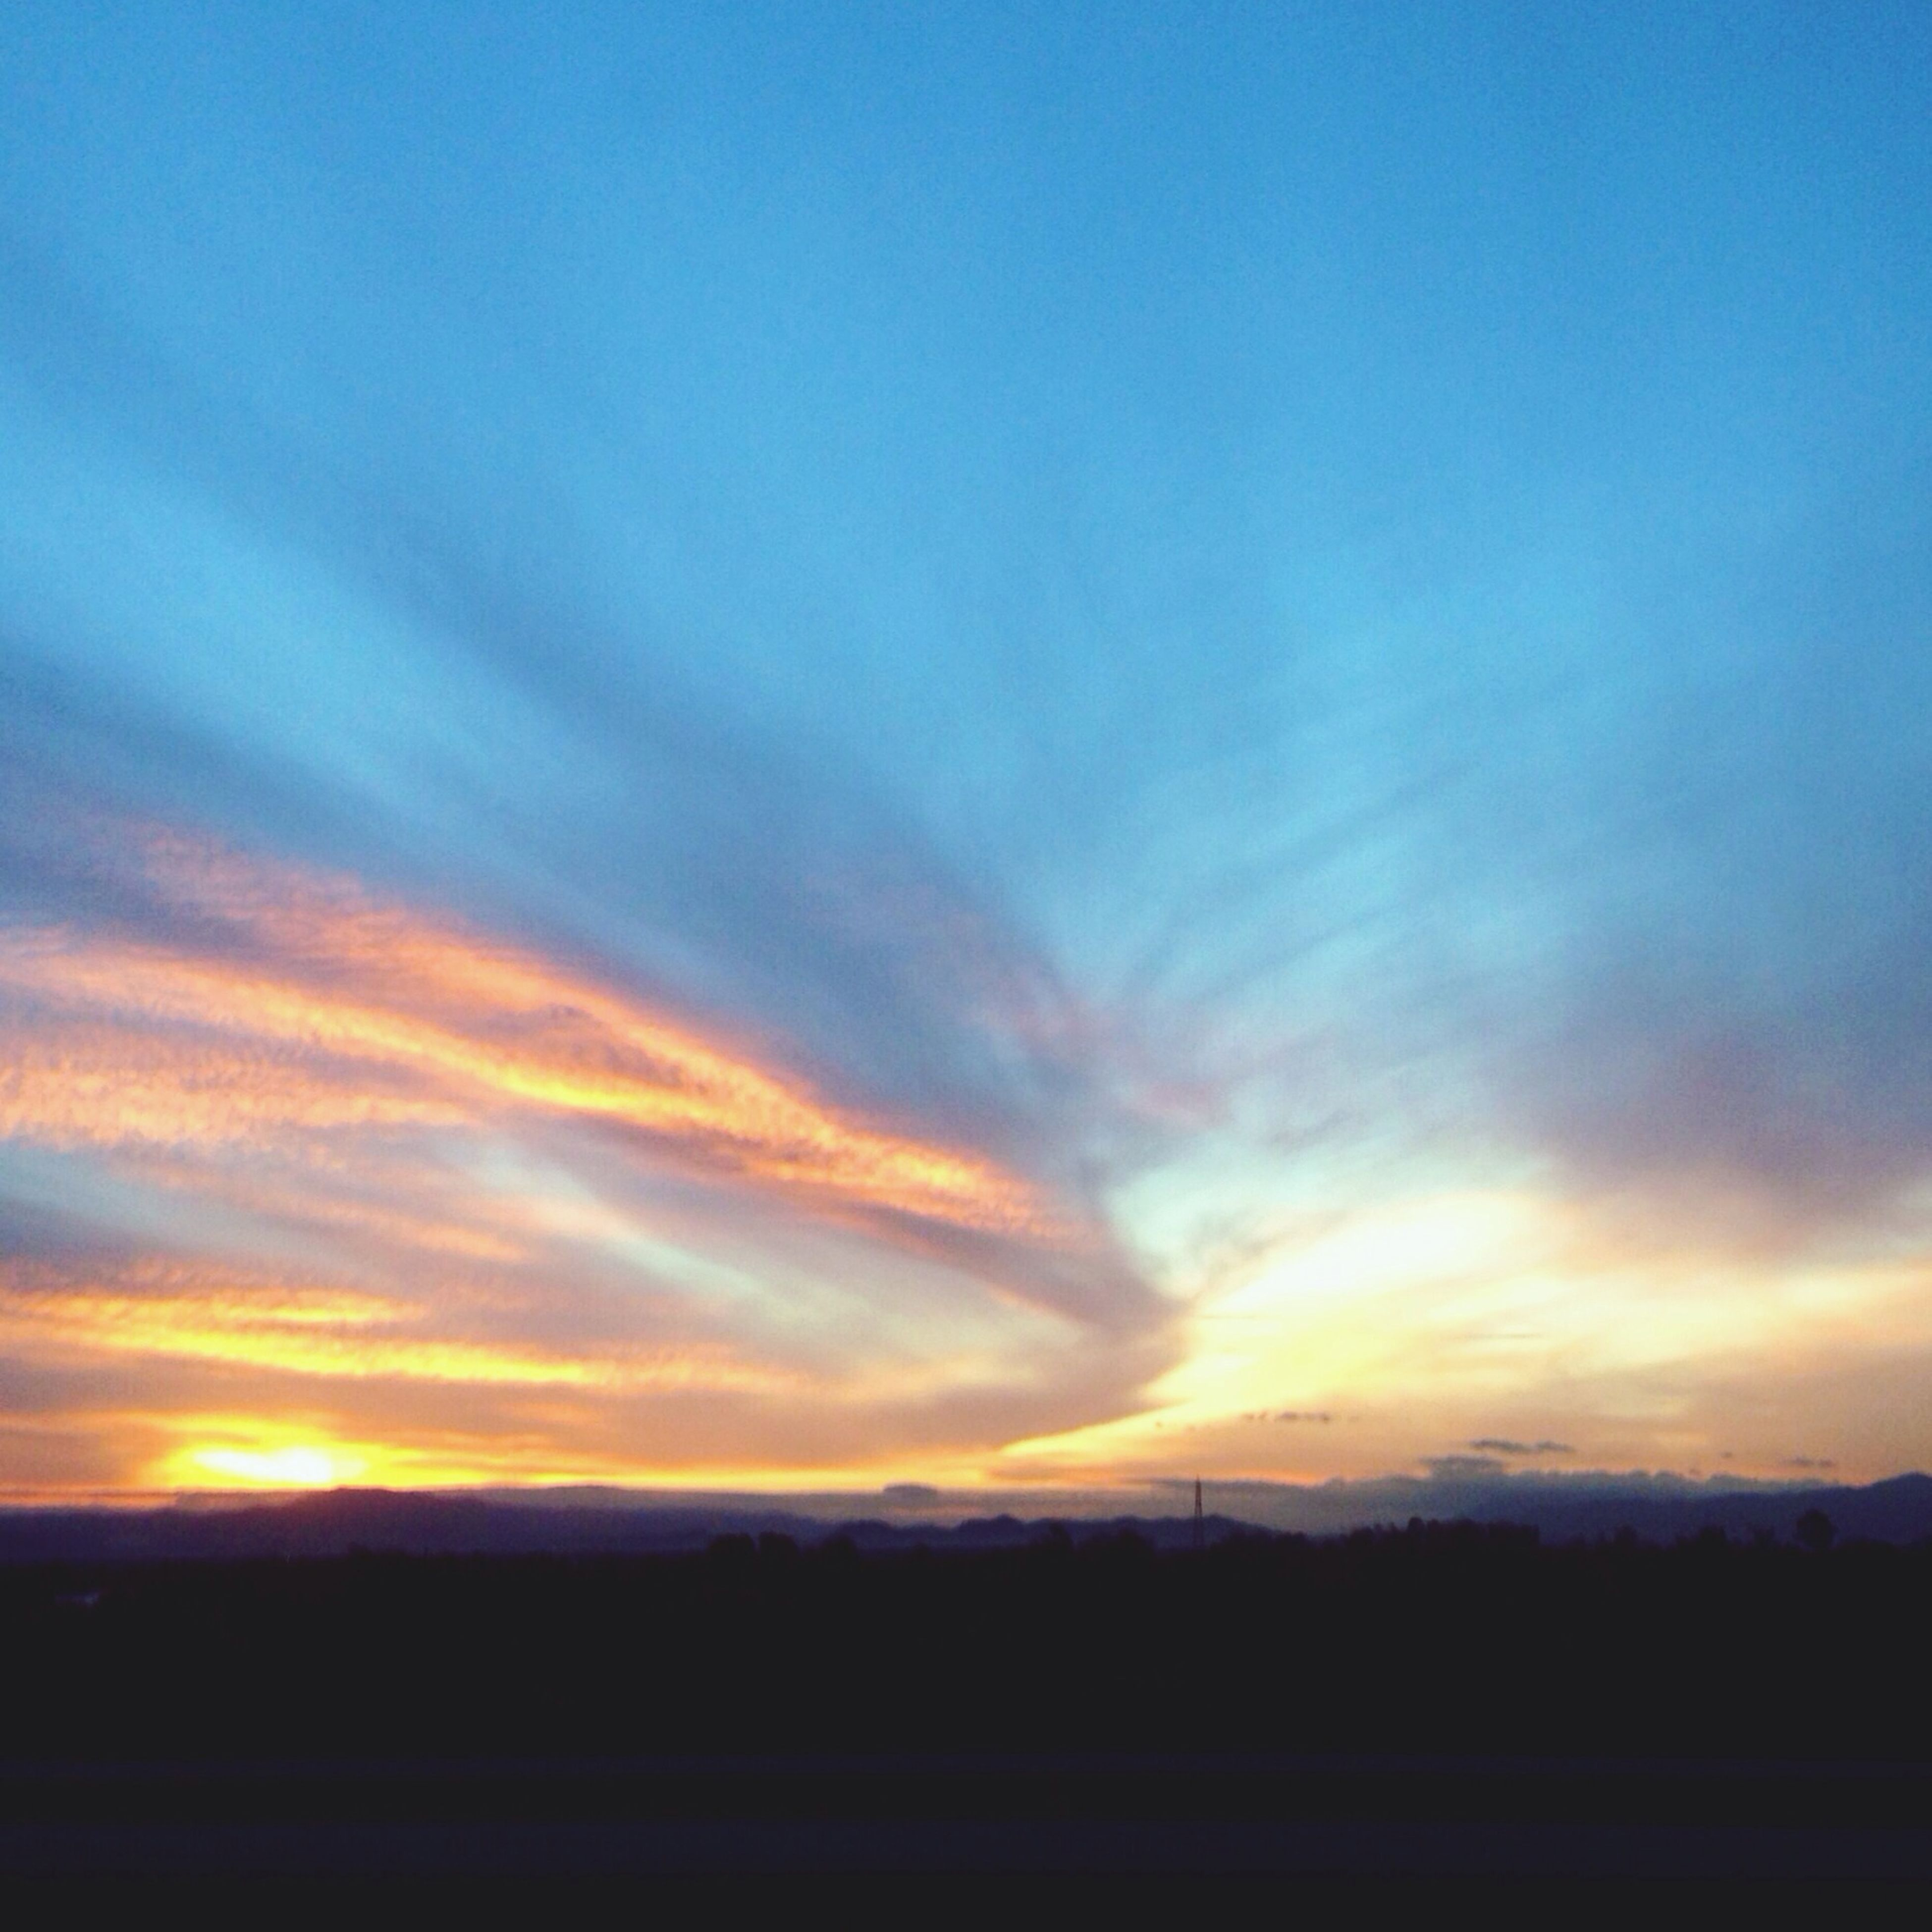 sunset, scenics, silhouette, tranquil scene, tranquility, sky, beauty in nature, orange color, landscape, nature, idyllic, cloud - sky, blue, cloud, copy space, dramatic sky, dusk, outdoors, field, no people